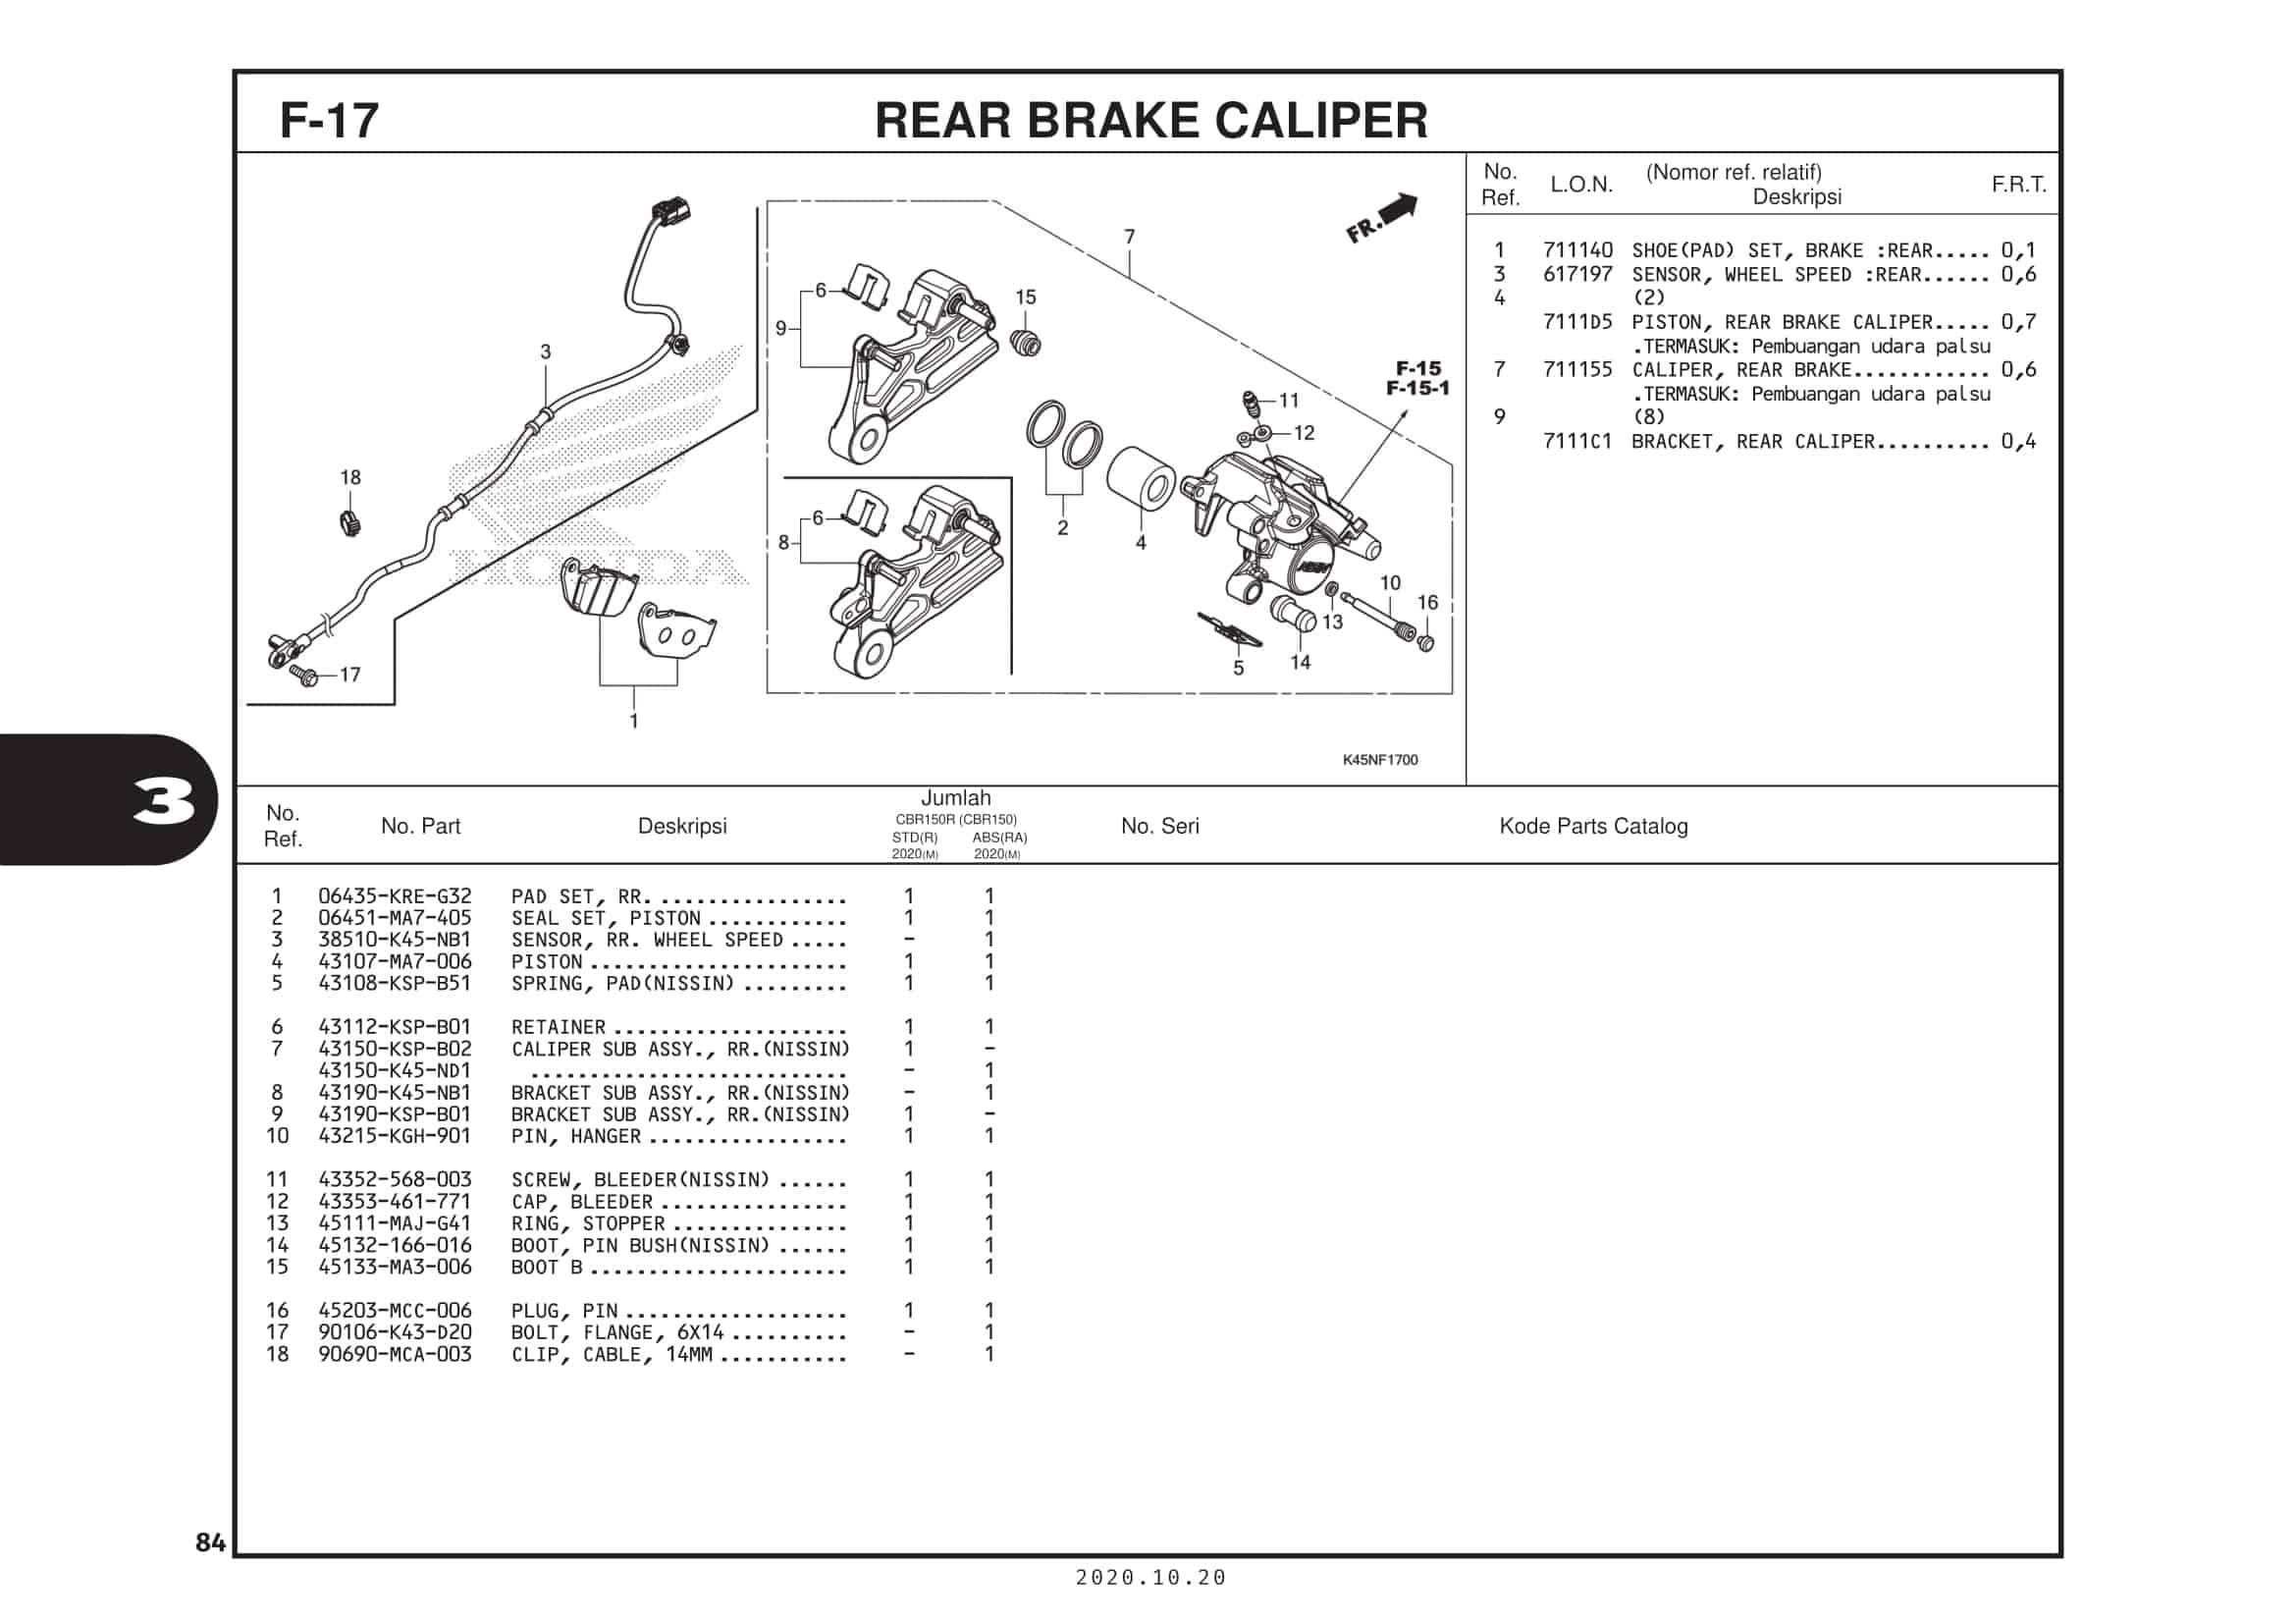 F-17 Rear Brake Caliper